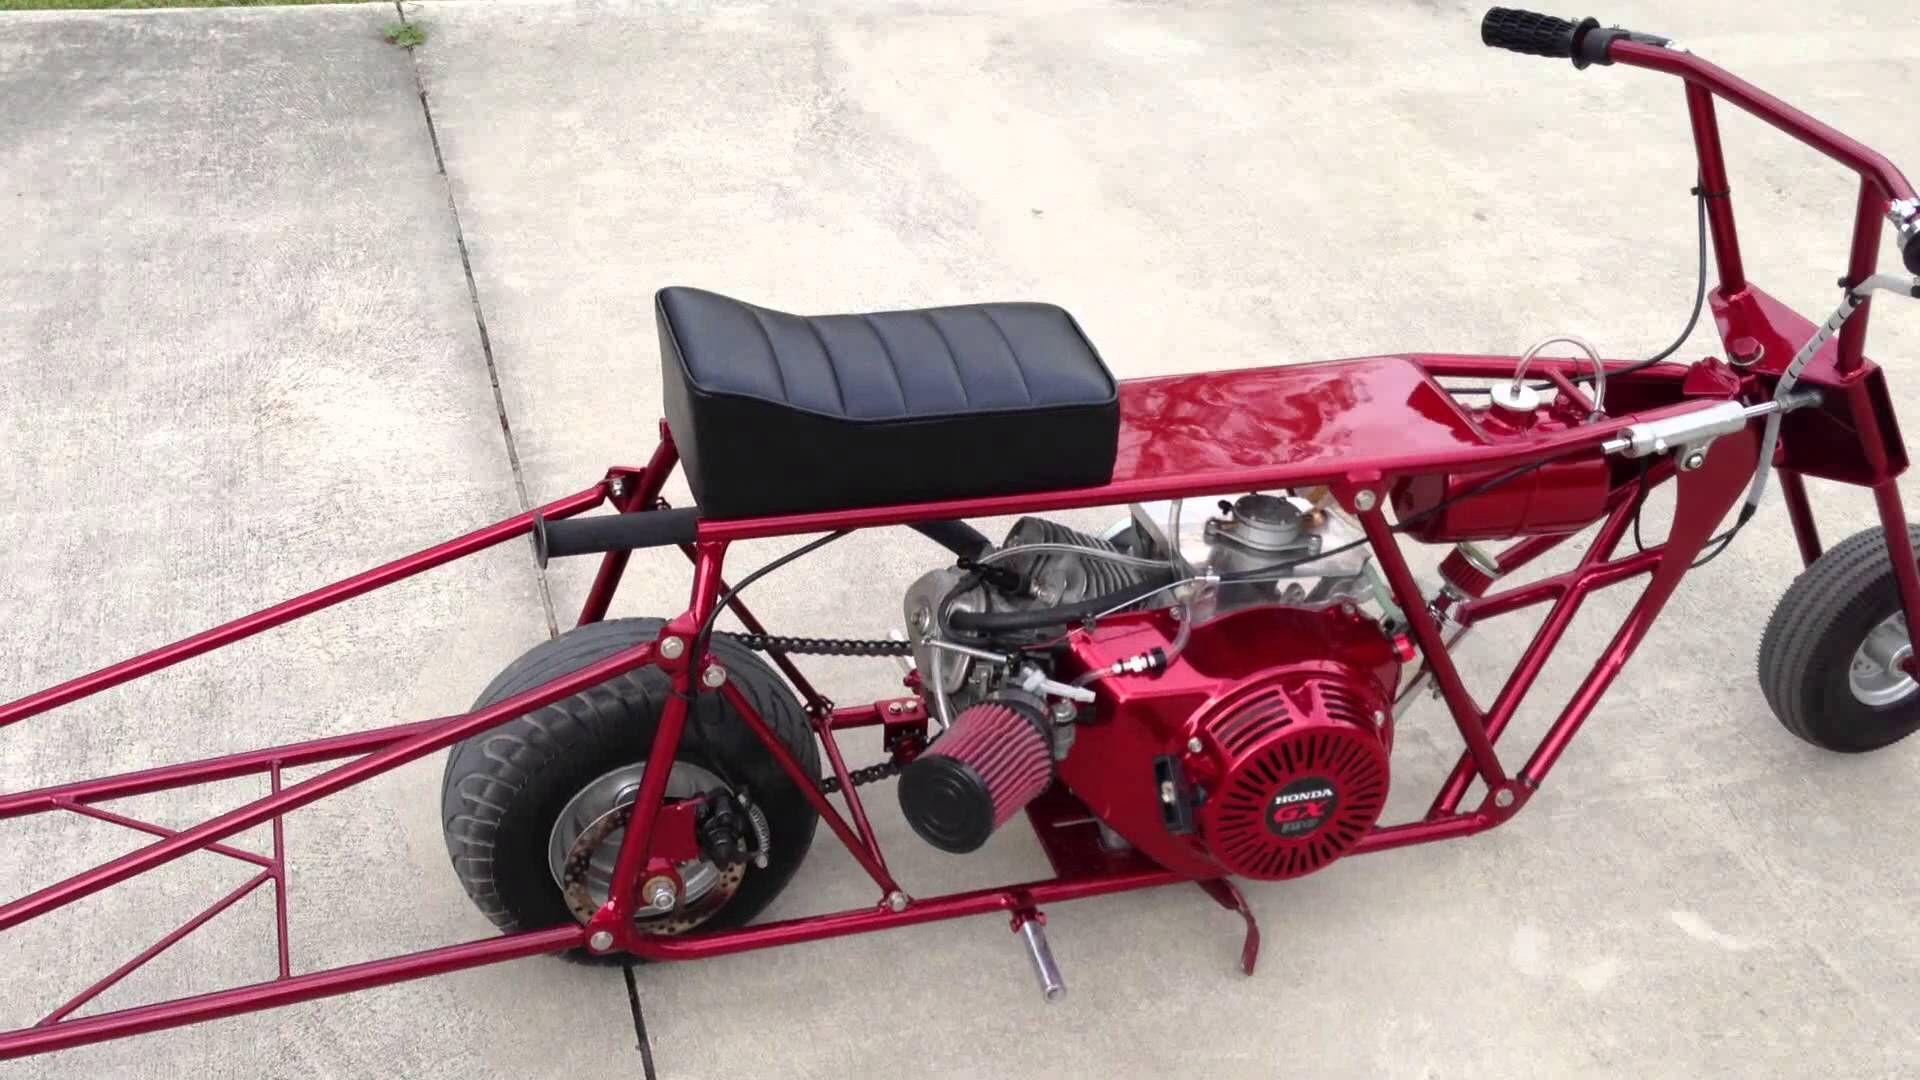 Mini Bike Accessories : Drag mini bike go karts bikes little buggys